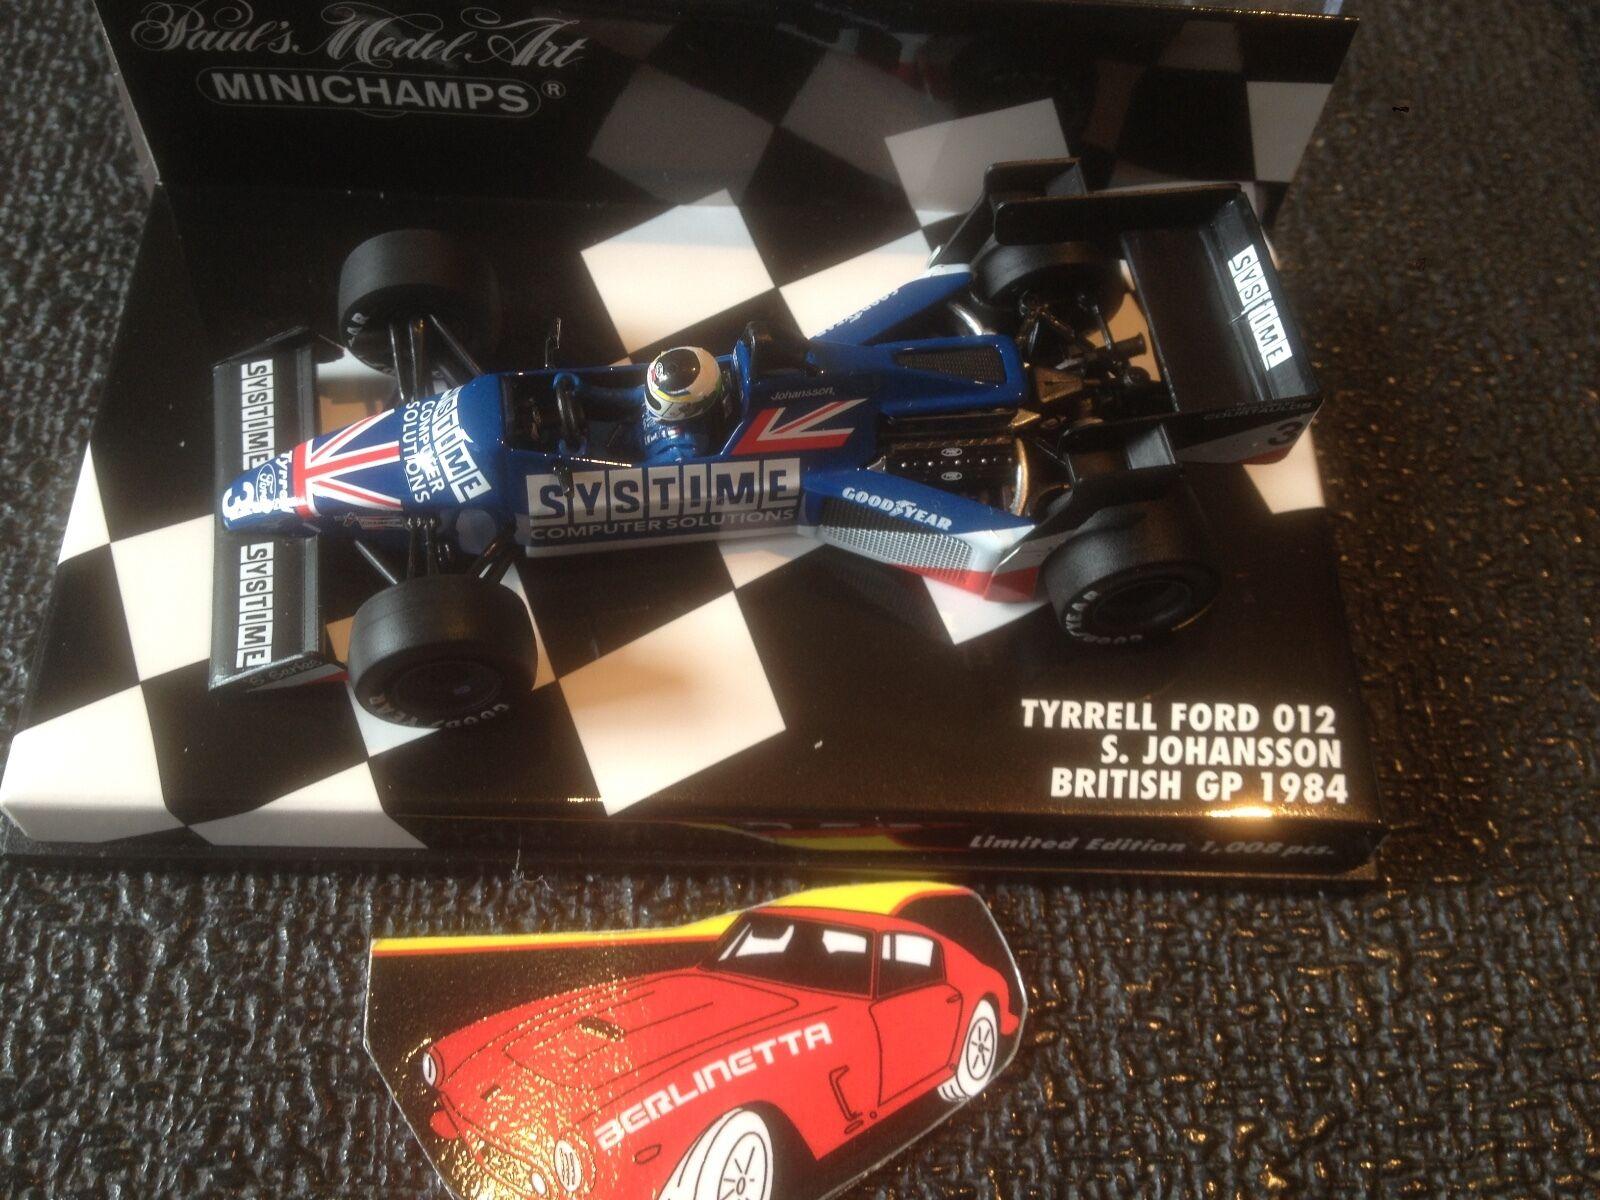 MINICHAMPS TYRRELL FORD  012 SYSTIME  3 USA BRITISH F1 GP 1984 S. JOHANSSON 1 43  bénéfice nul